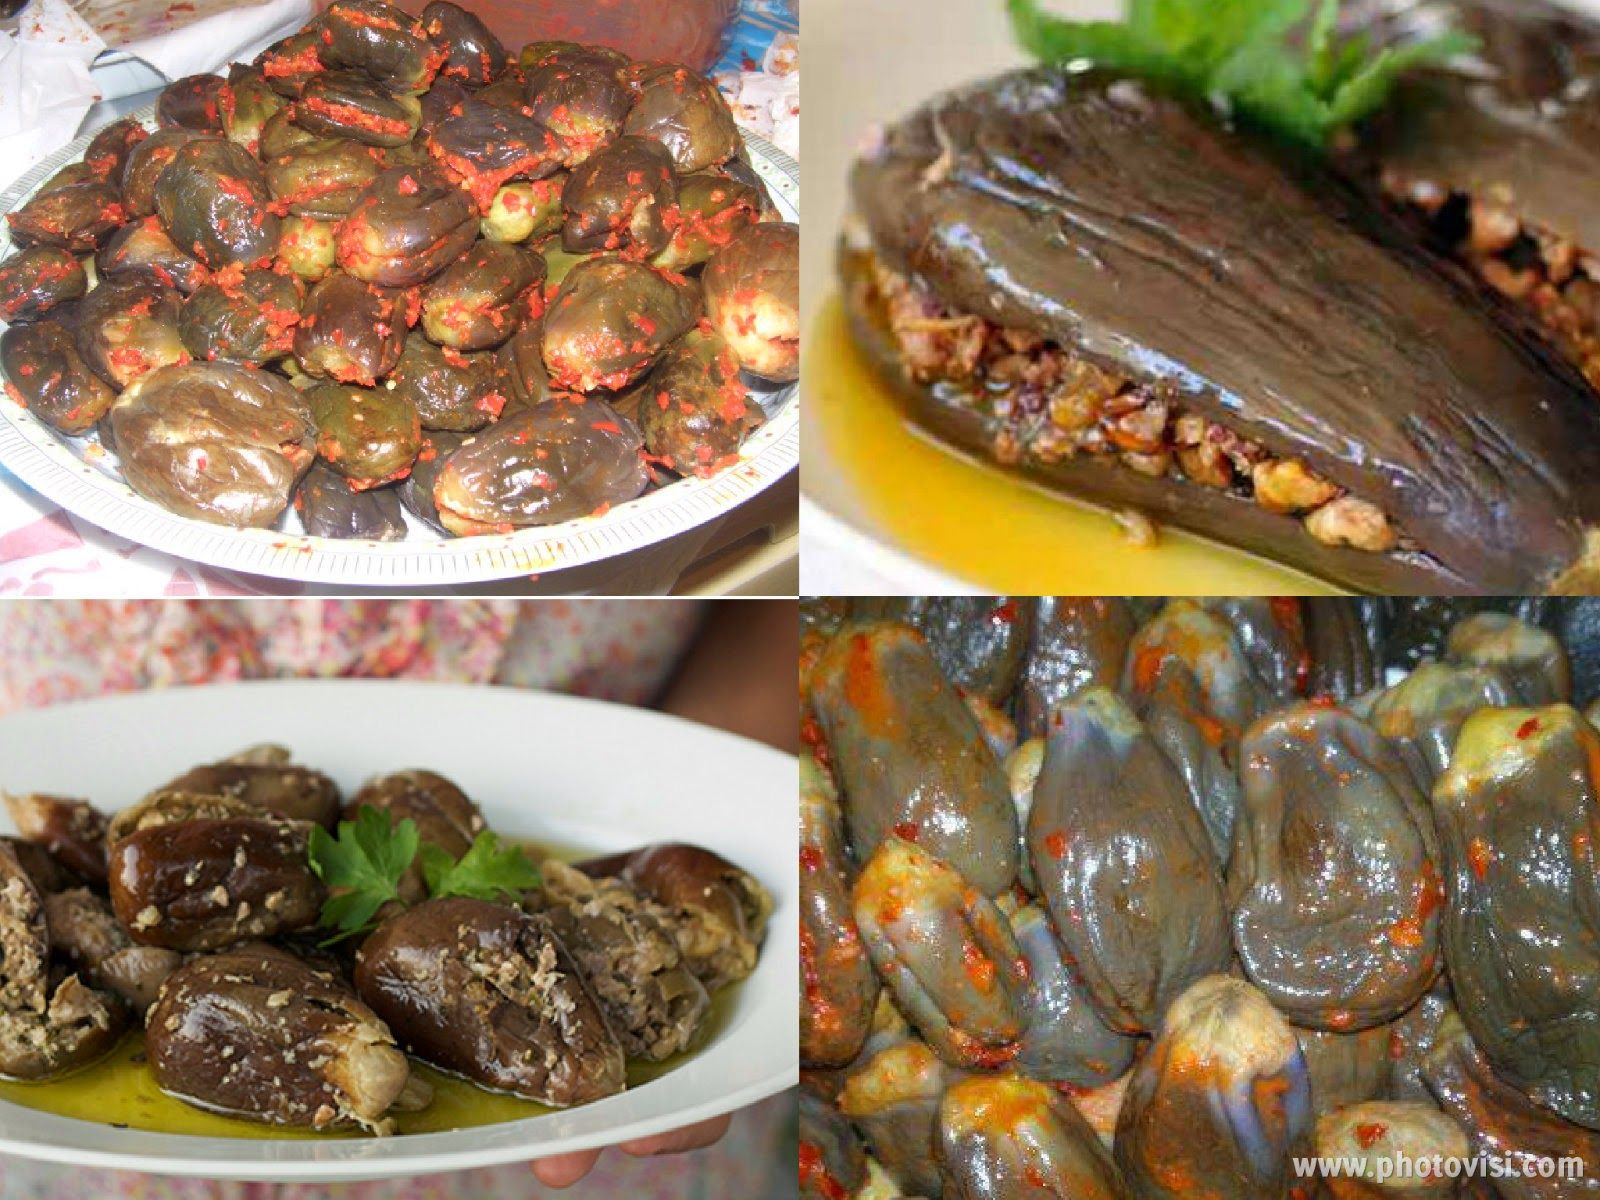 عالم الطبخ والجمال مكدوس Syrian Food Middle Eastern Recipes Vegetarian Recipes